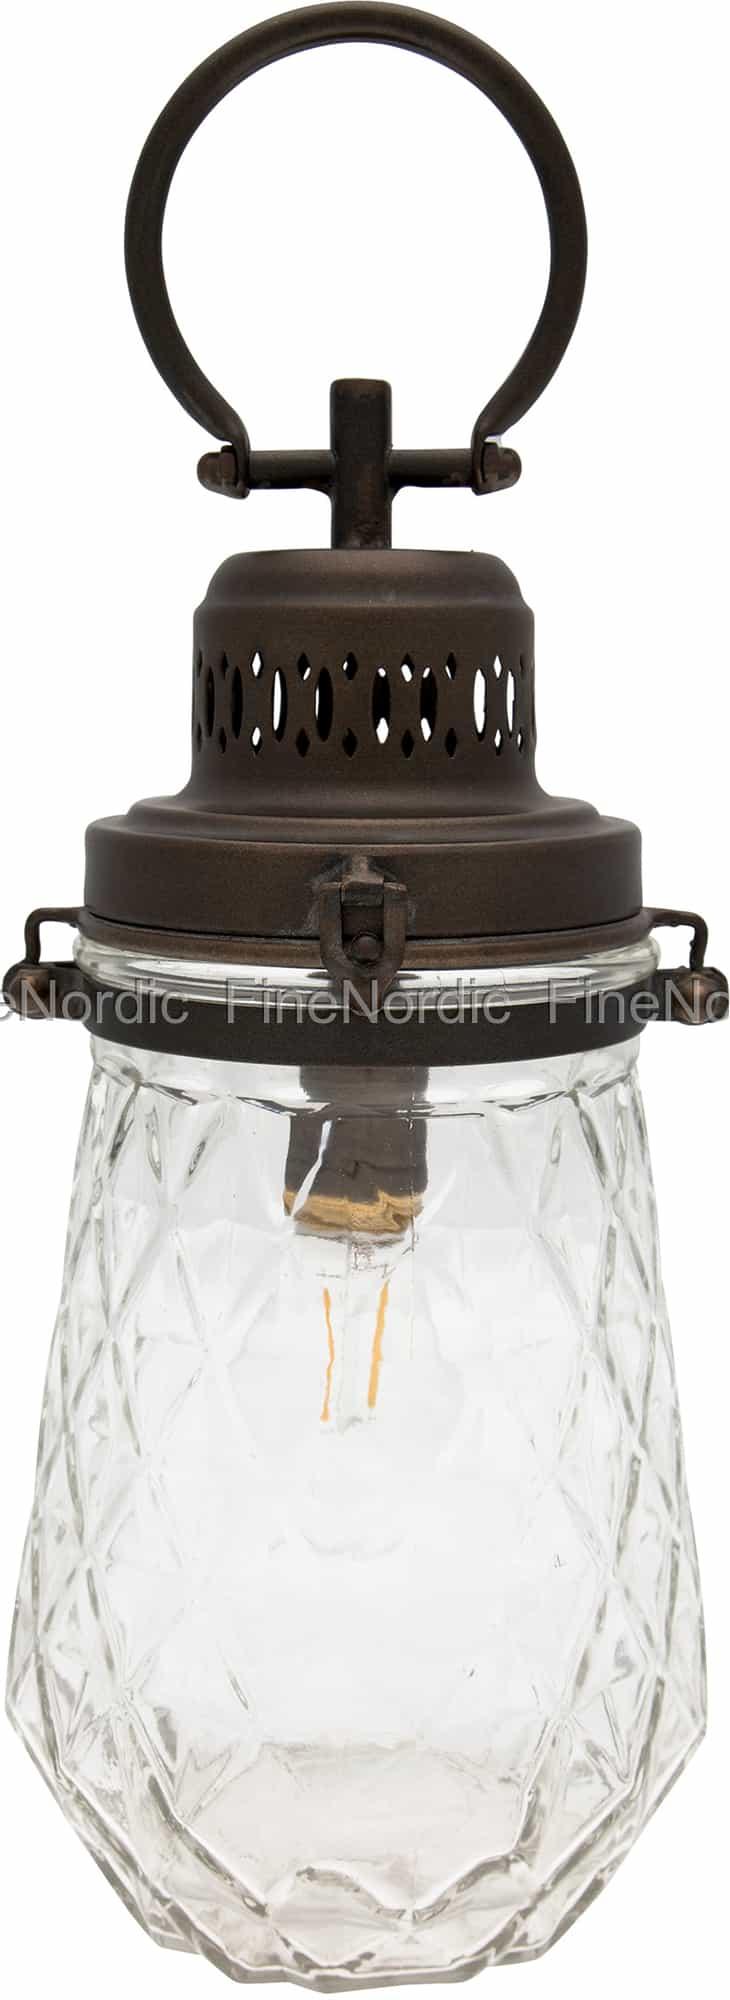 GreenGate Lampe Check Clear med Håndtak